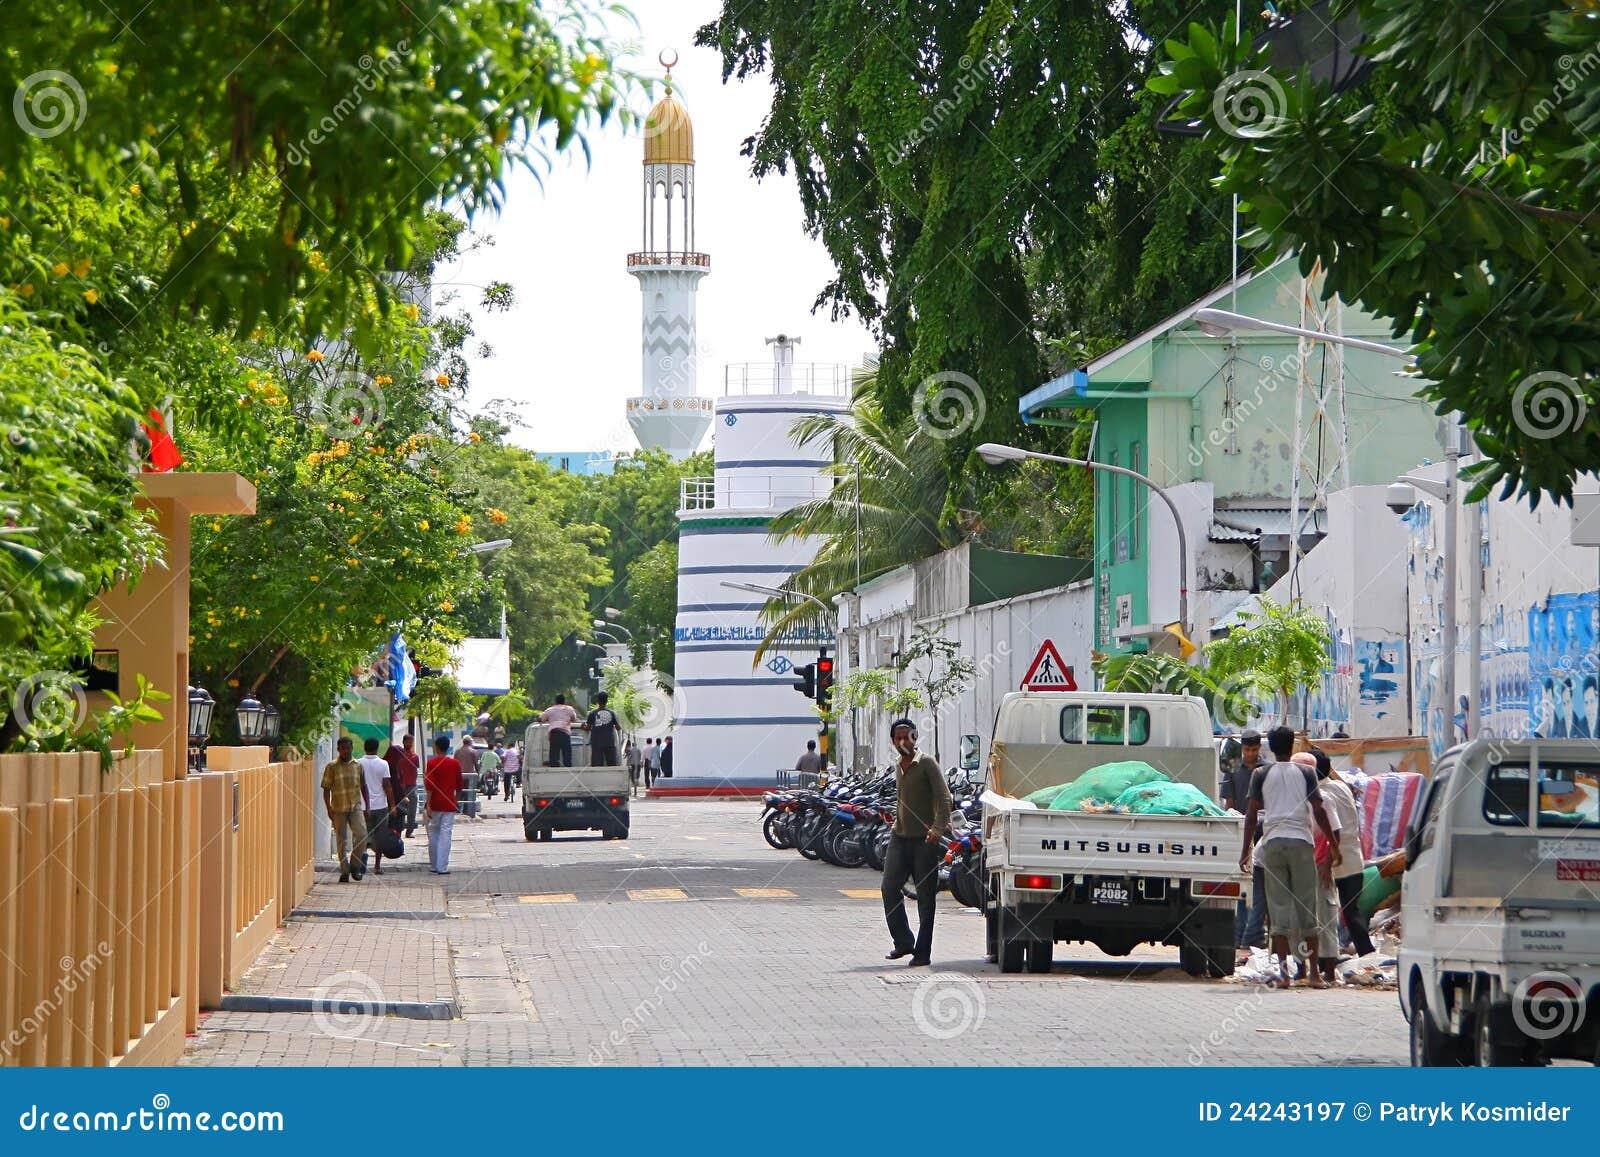 Capital de Maldivas, ciudad capital de Maldivas, Male